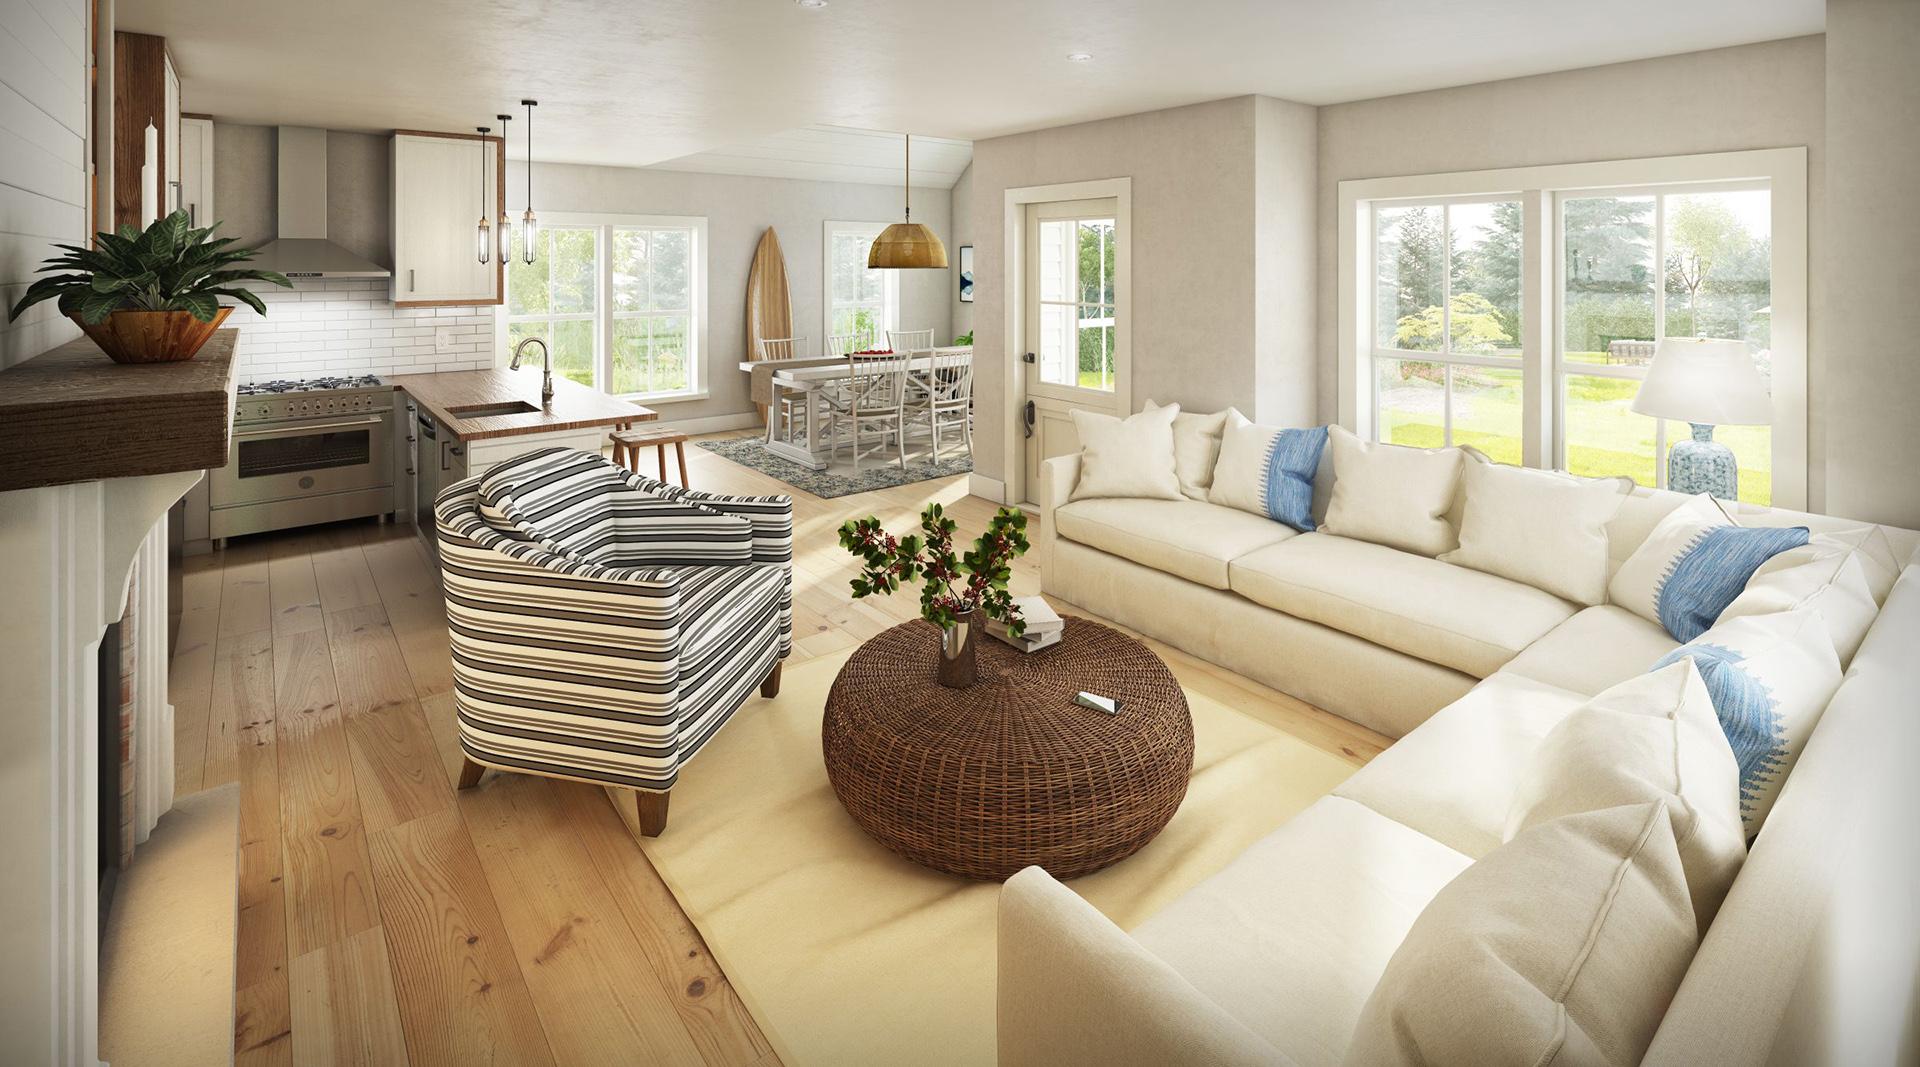 Profile Homes Cottage Interior © 2018 Profile Homes